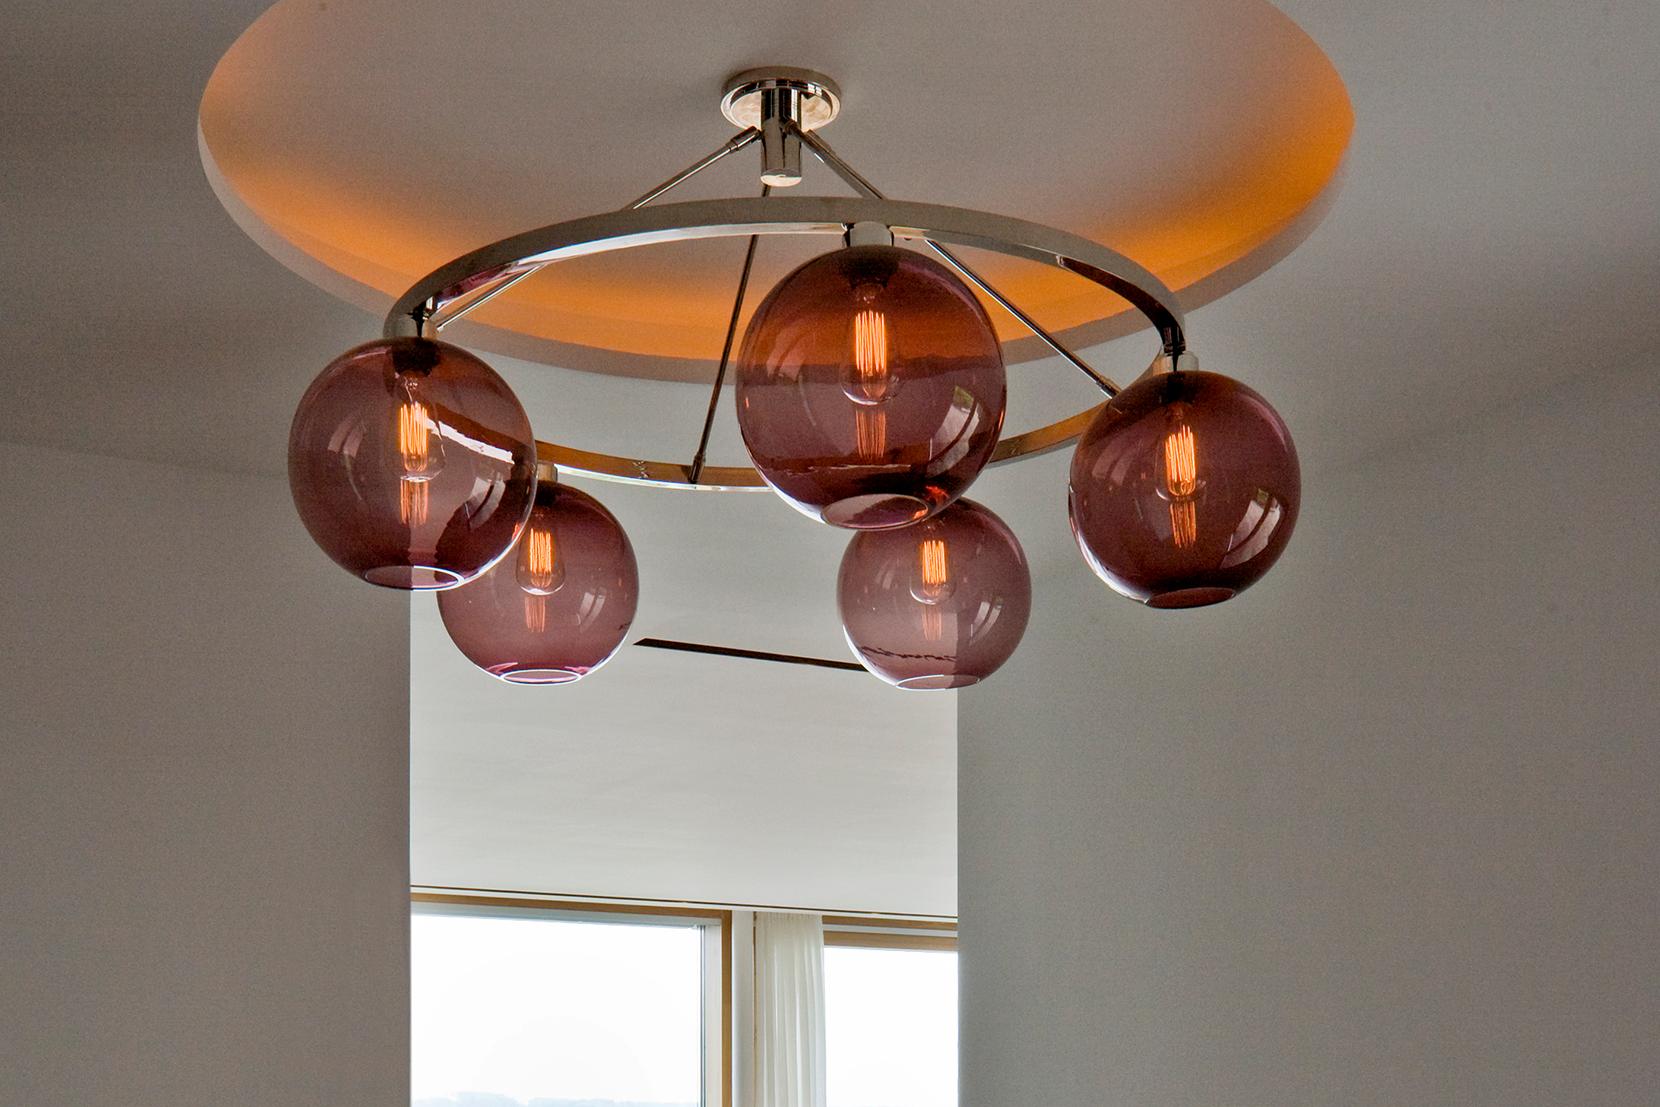 Modern Glass Entry Way Lighting - Plum Solitaire Chandelier